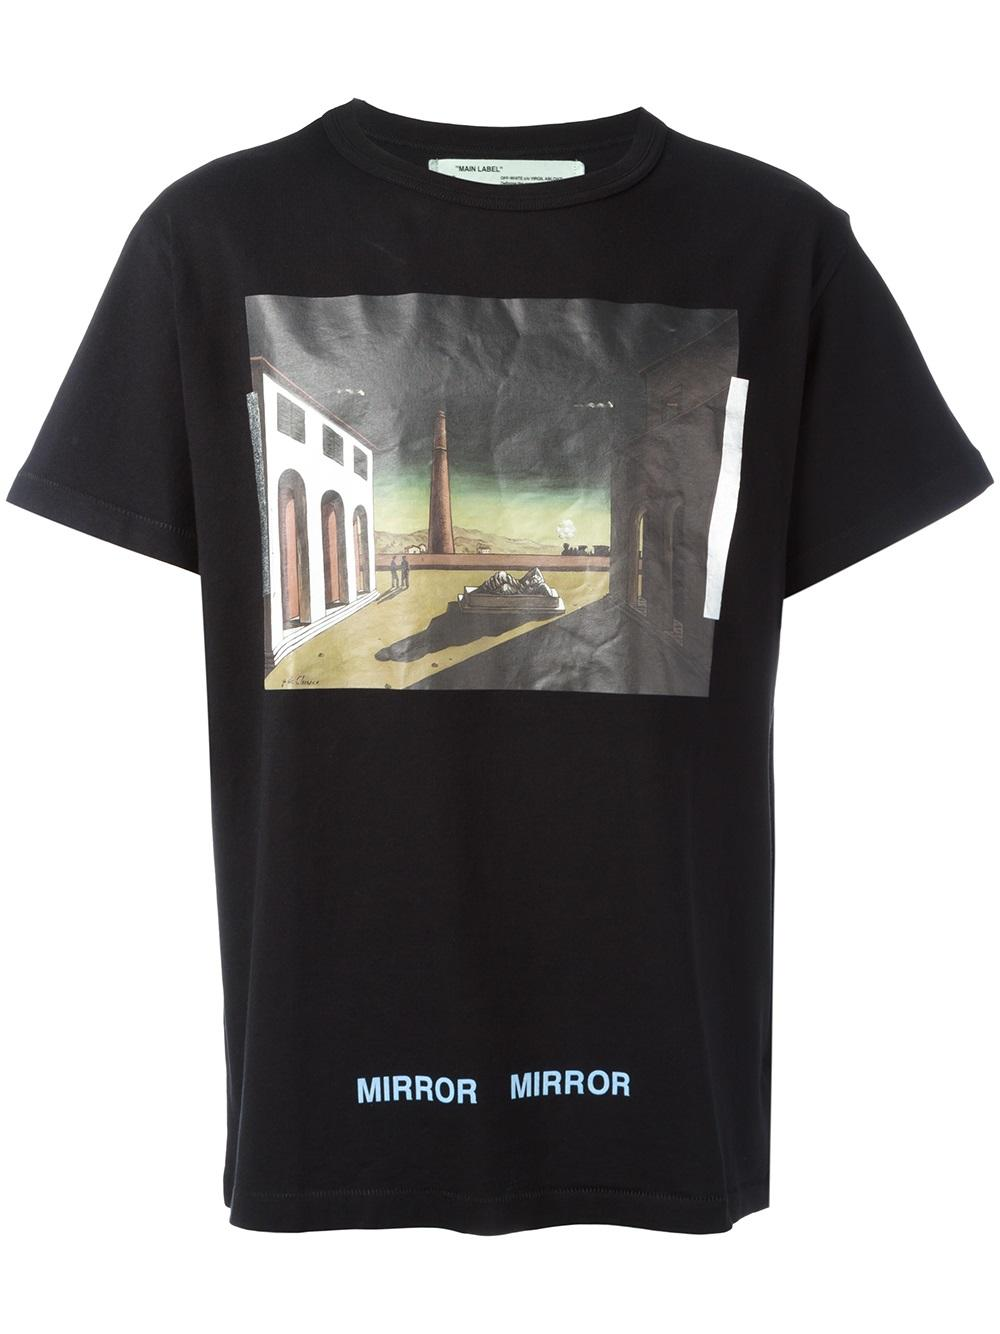 1e4e8eac Off-White 'De Chirico' T-shirt - Farfetch